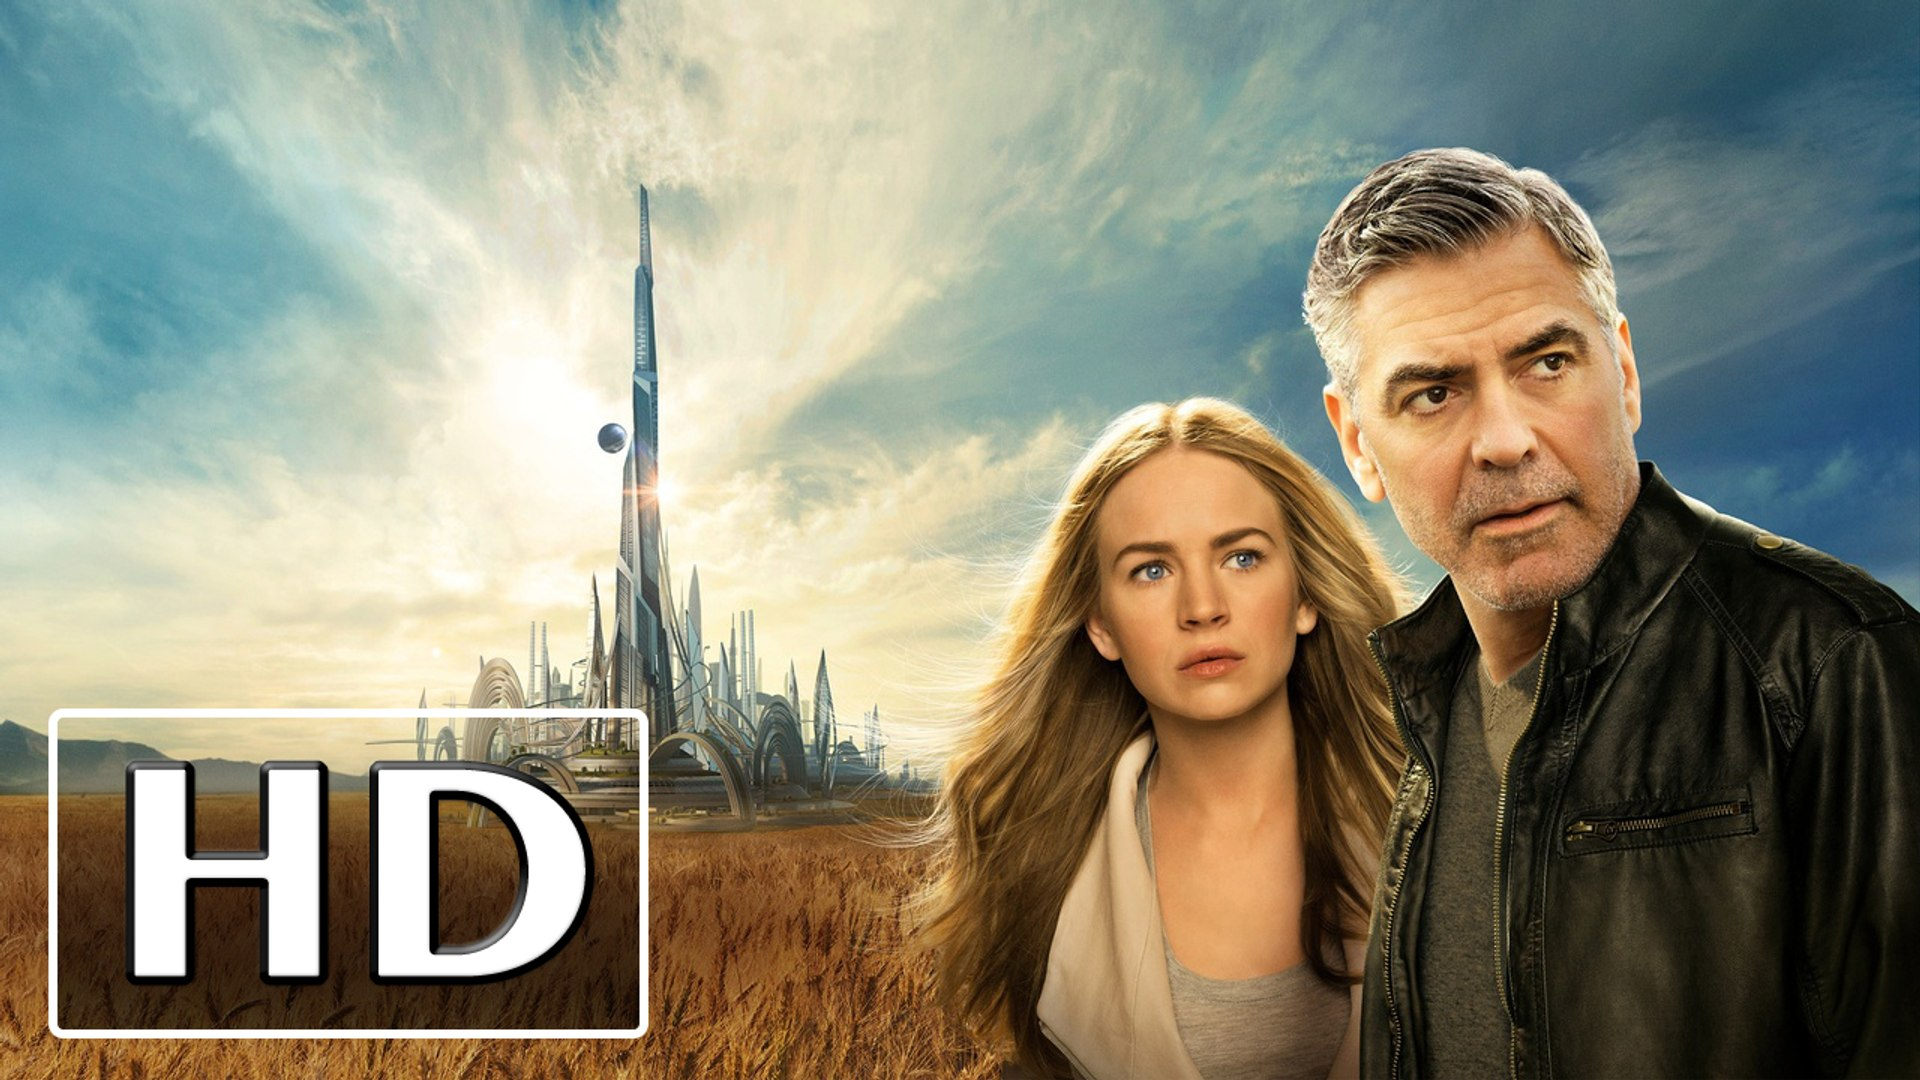 Tomorrowland 2015 Complet Movie Streaming VF en Français Gratuit ✰ 1080p HD ✰